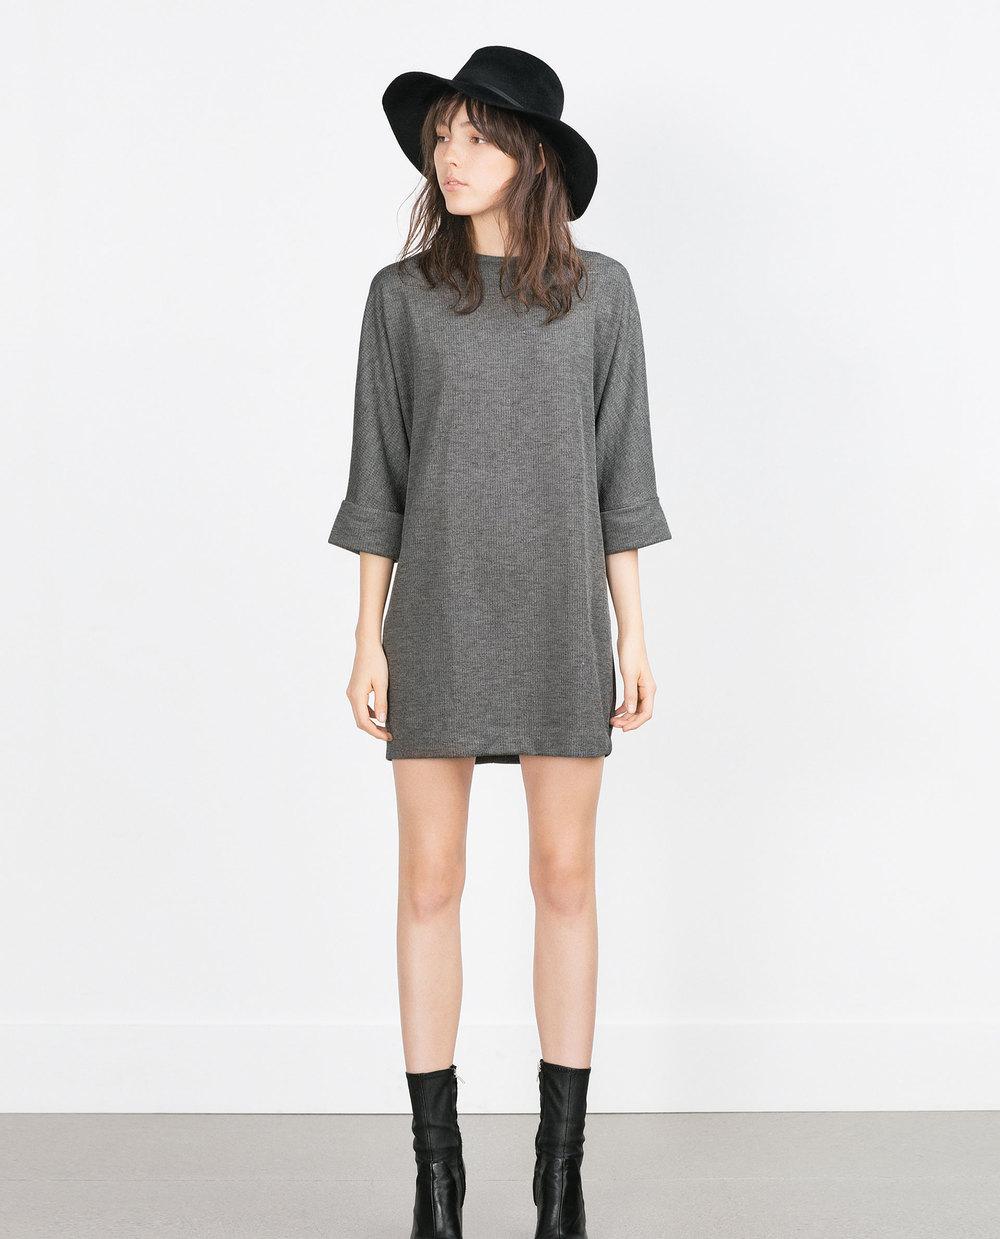 Combined Ponte Di Roma Dress. Zara. $39.